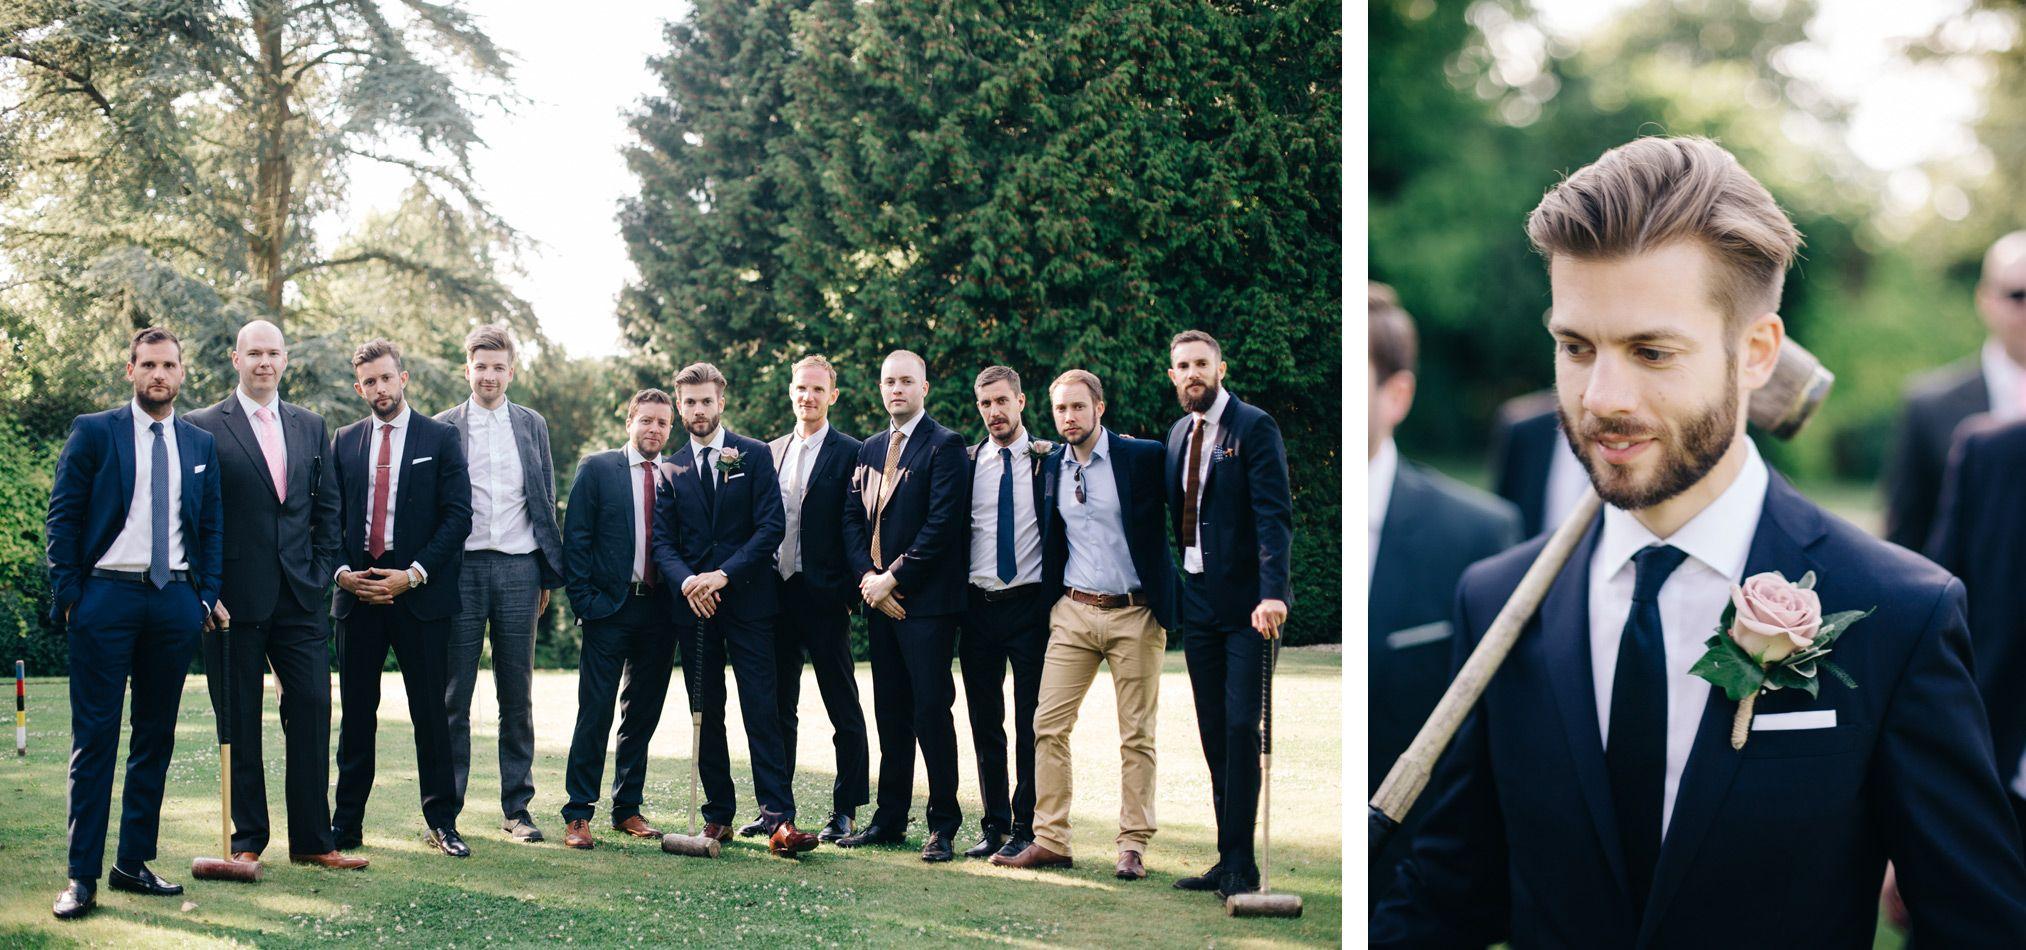 Groom Groomsmen Wedding Photography Barnsley House Cotswolds Country House Garden Stylish Luxury Fine Art Navy Suit Group Shot